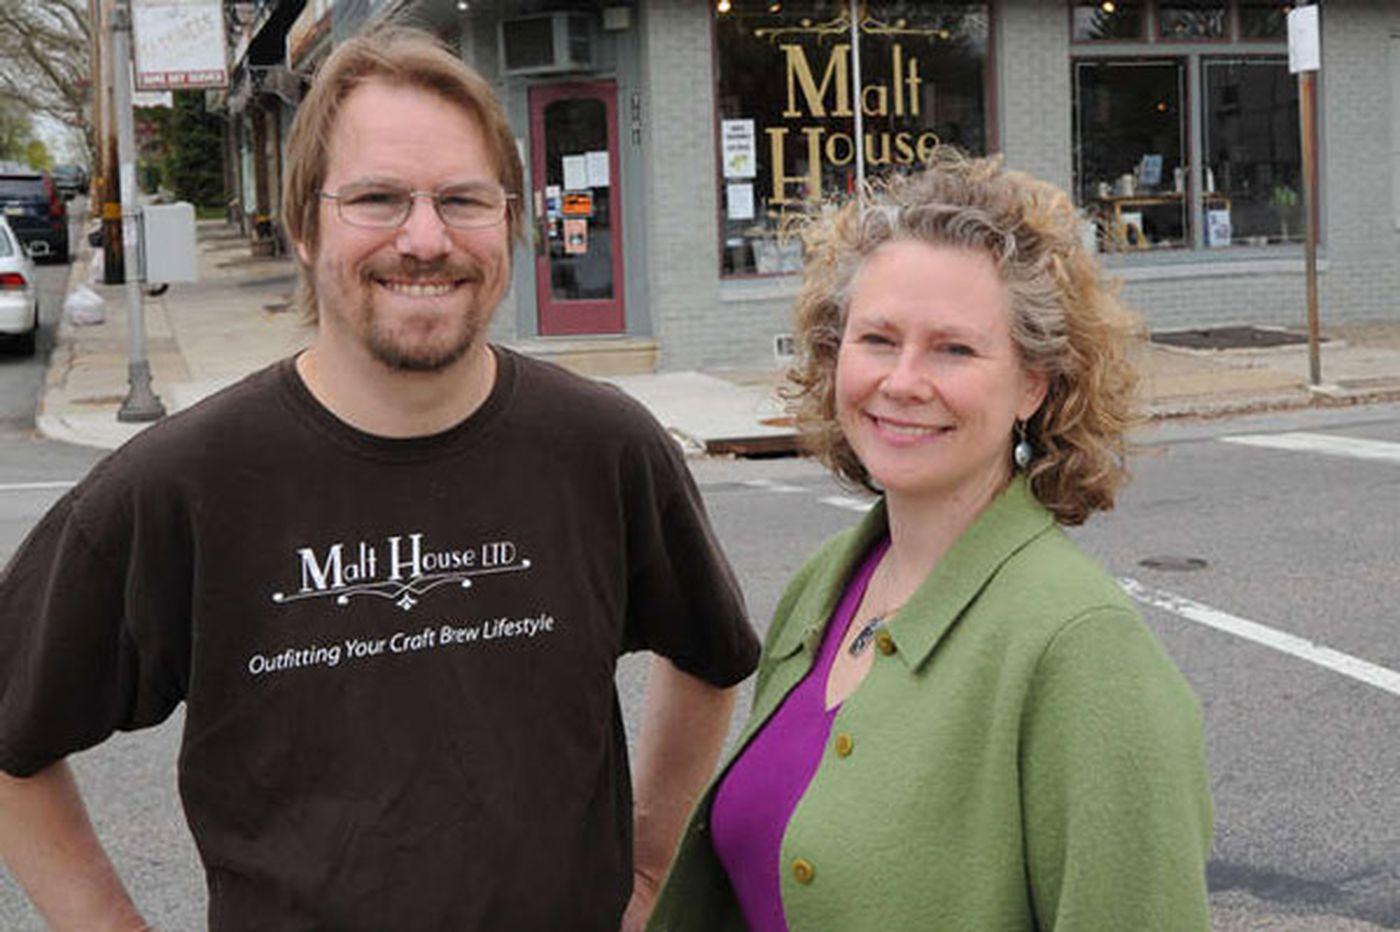 Entrepreneurs unite: Real estate meets beer